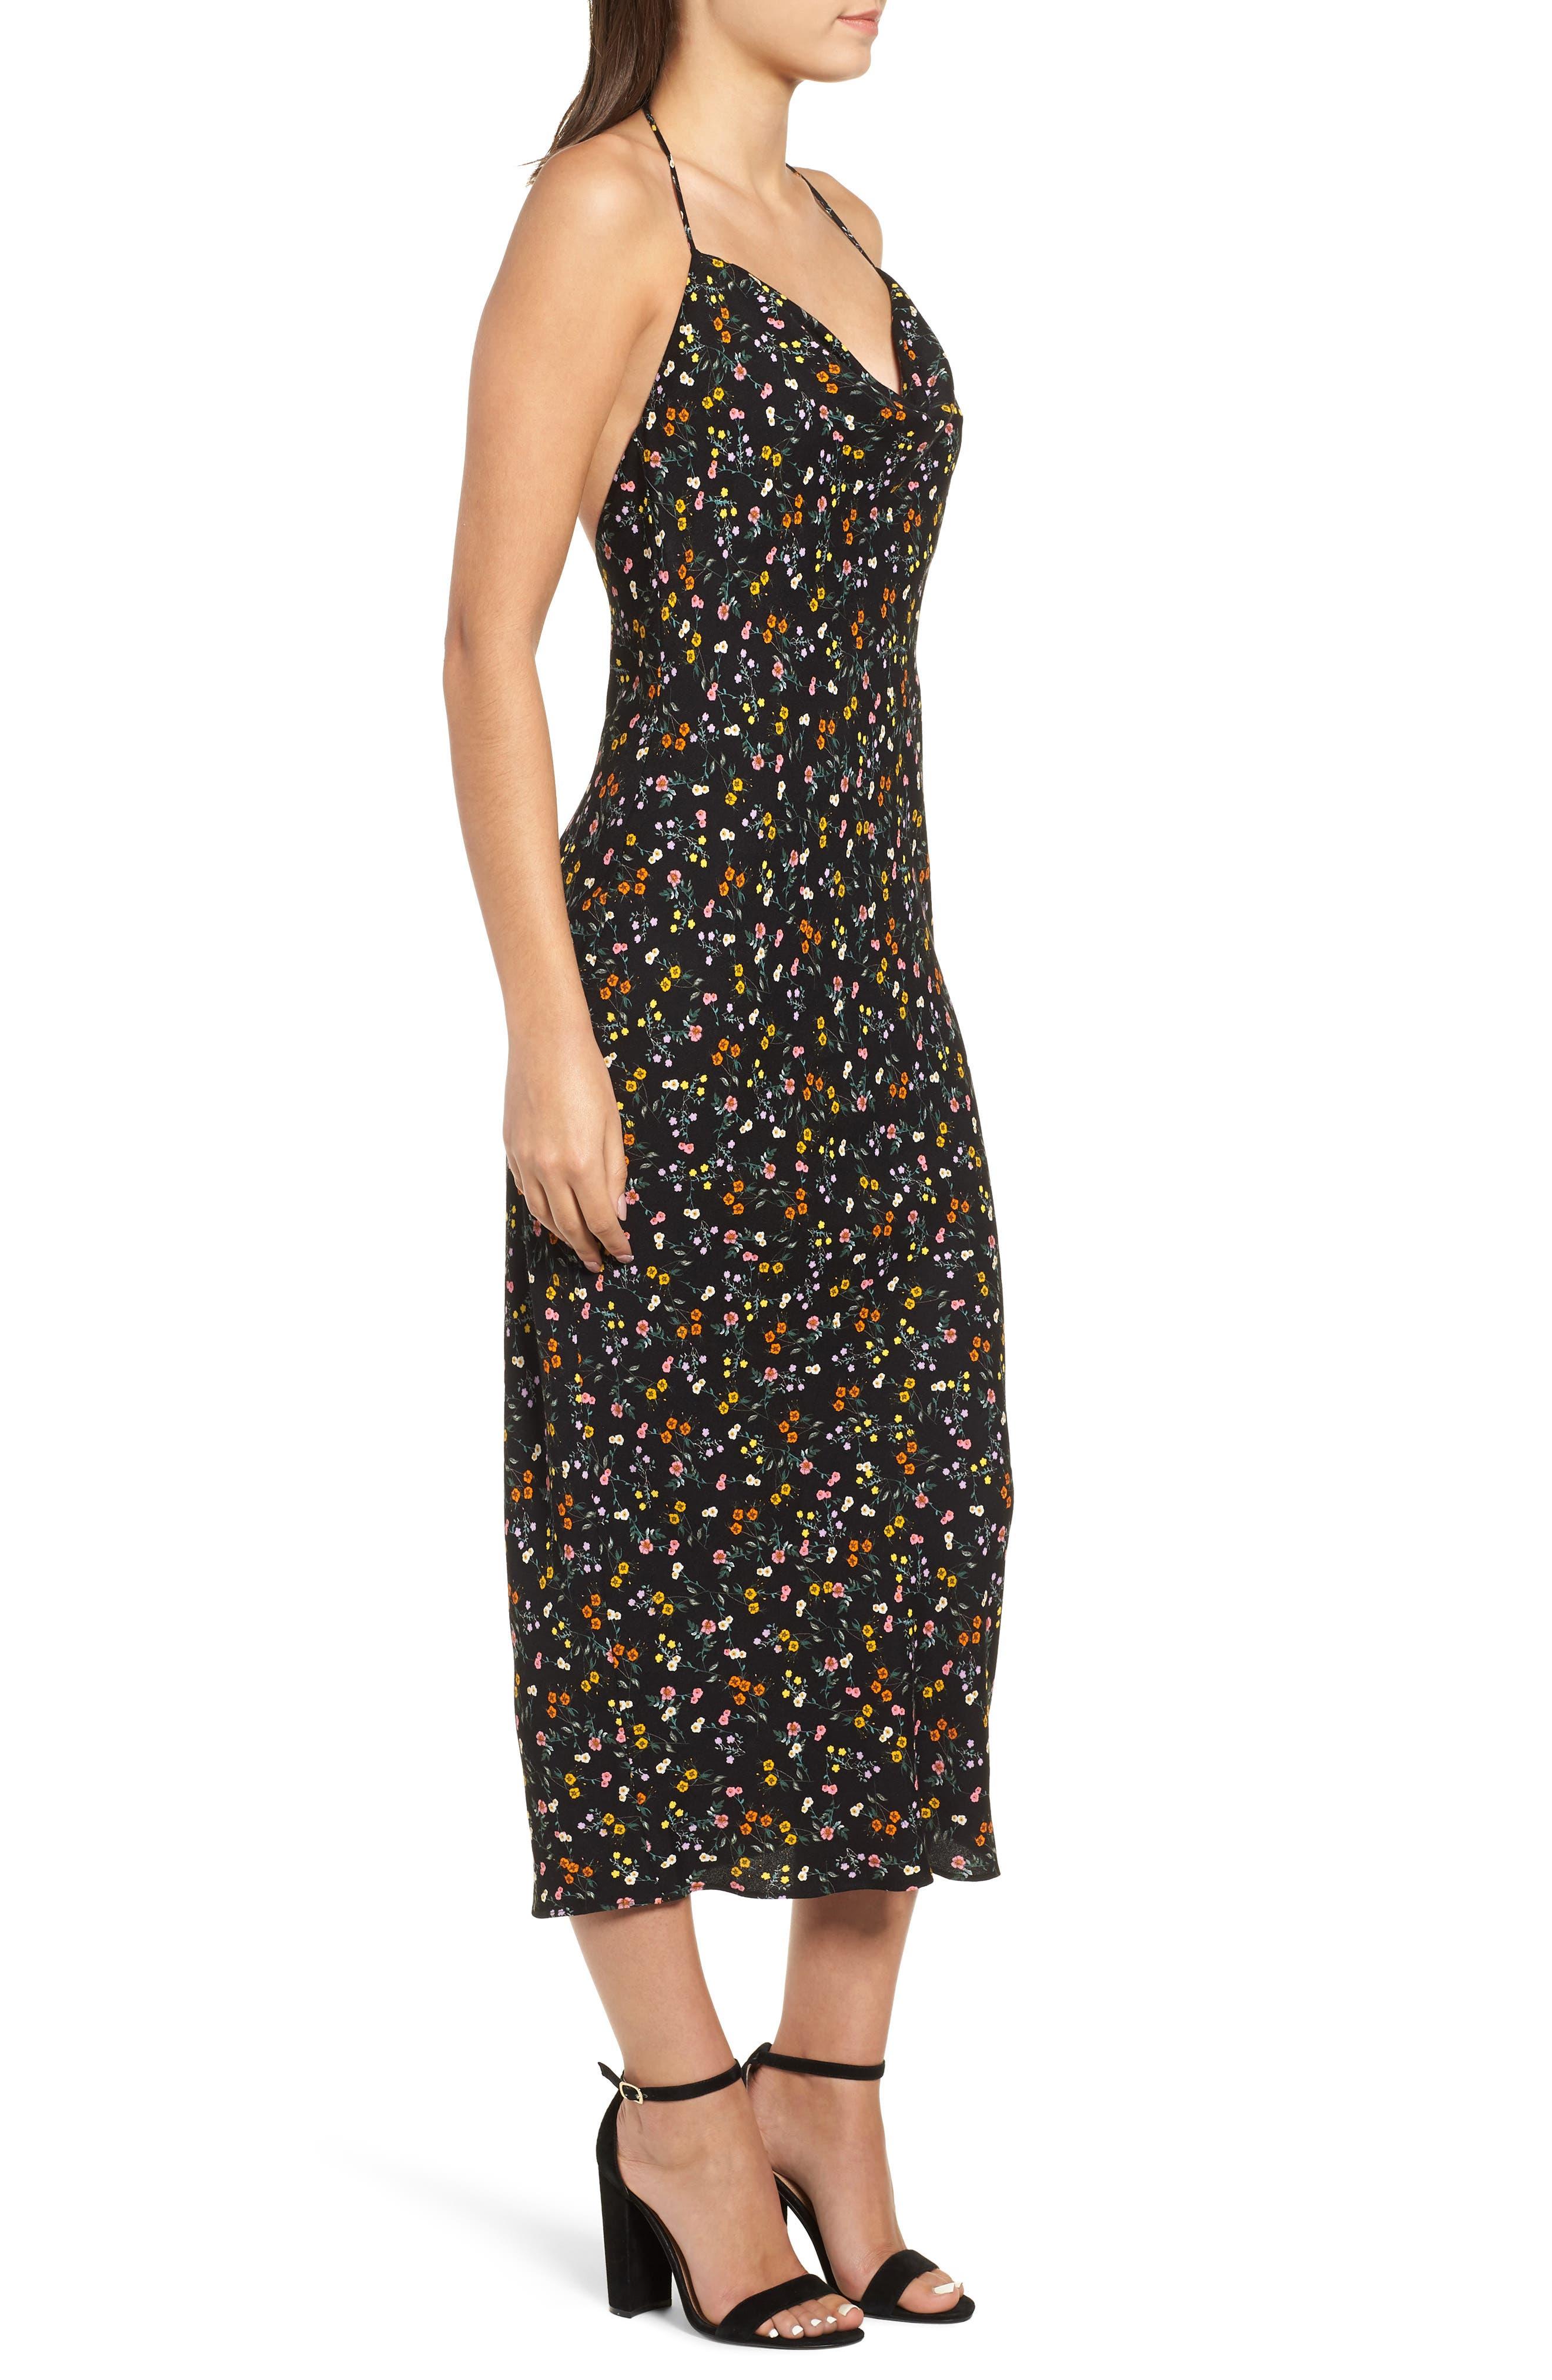 Rowland Midi Dress,                             Alternate thumbnail 3, color,                             NOIR PETITE FLEUR